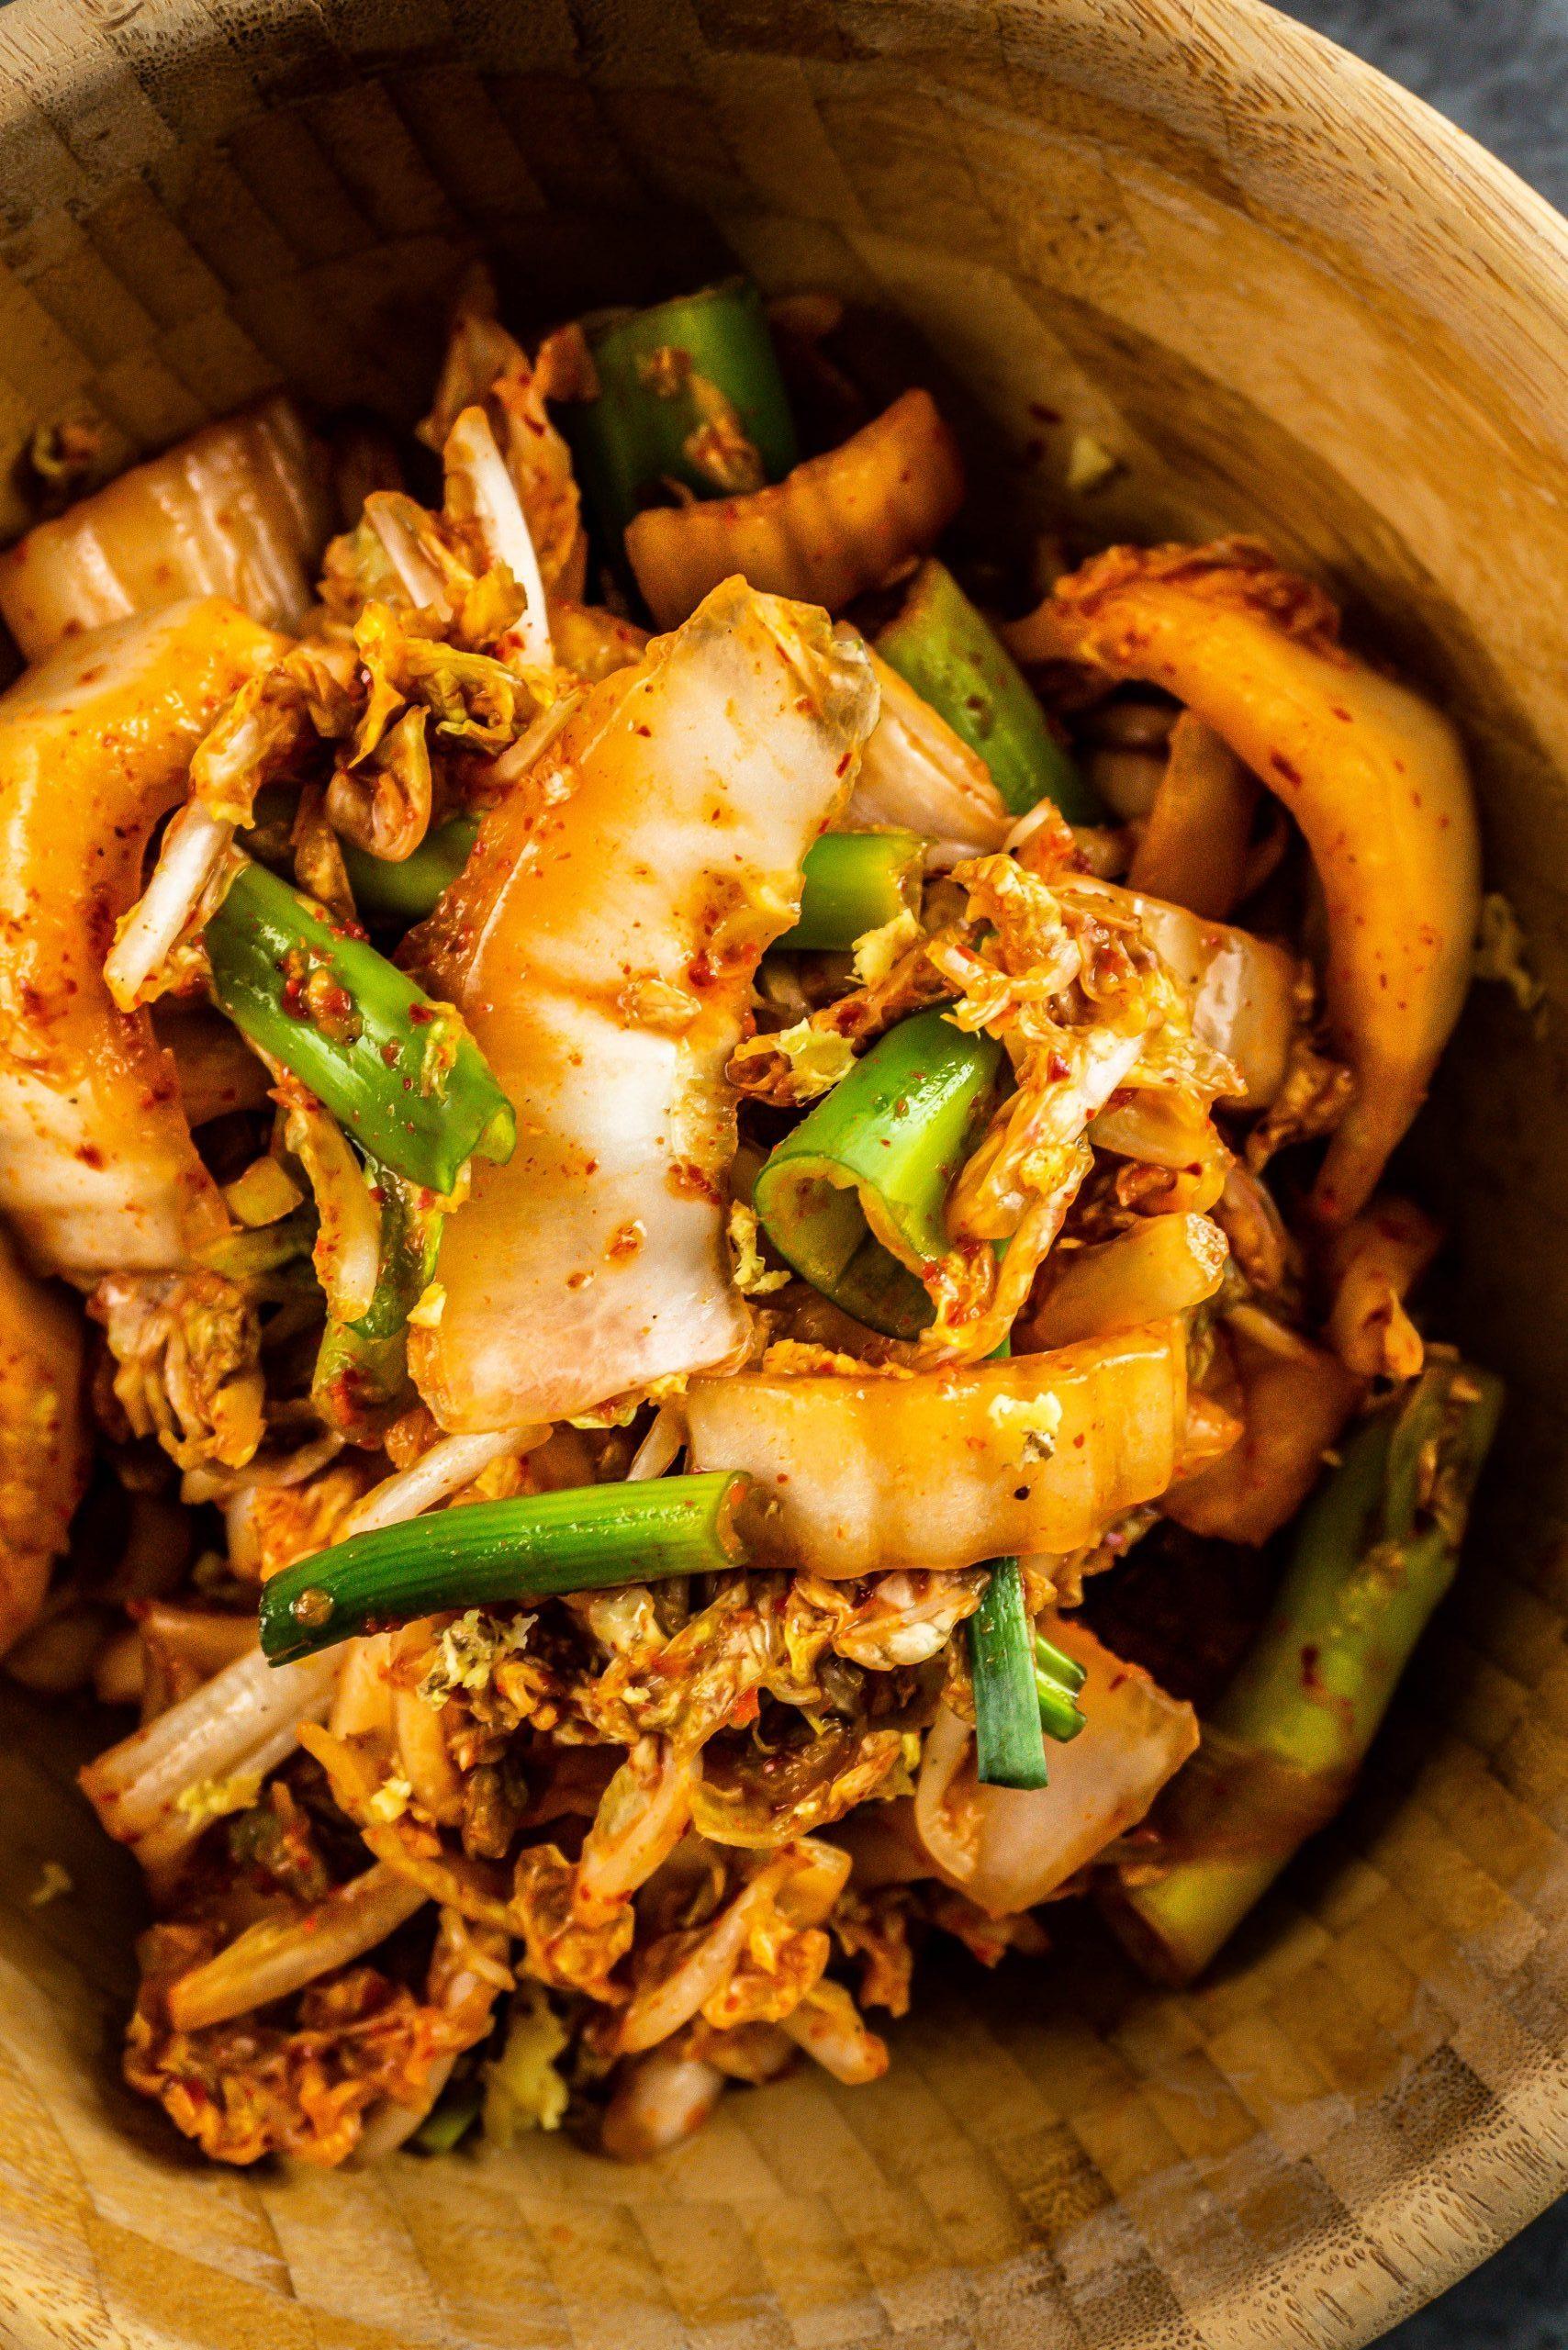 Delicious Vegan Kimchi photographed up close